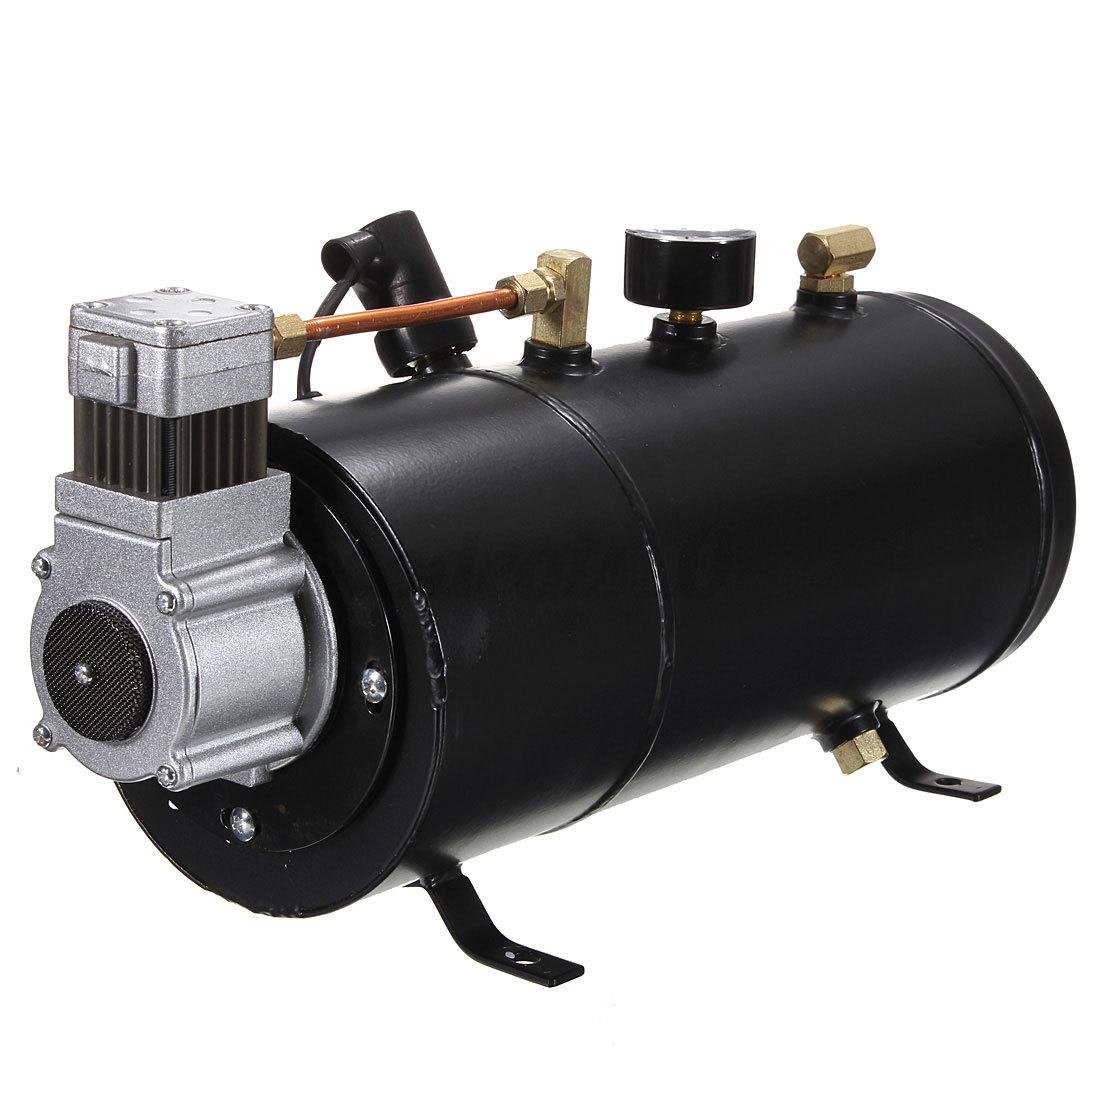 Semi Truck Air Tanks : Psi v heavy duty compact air horn compressor tank